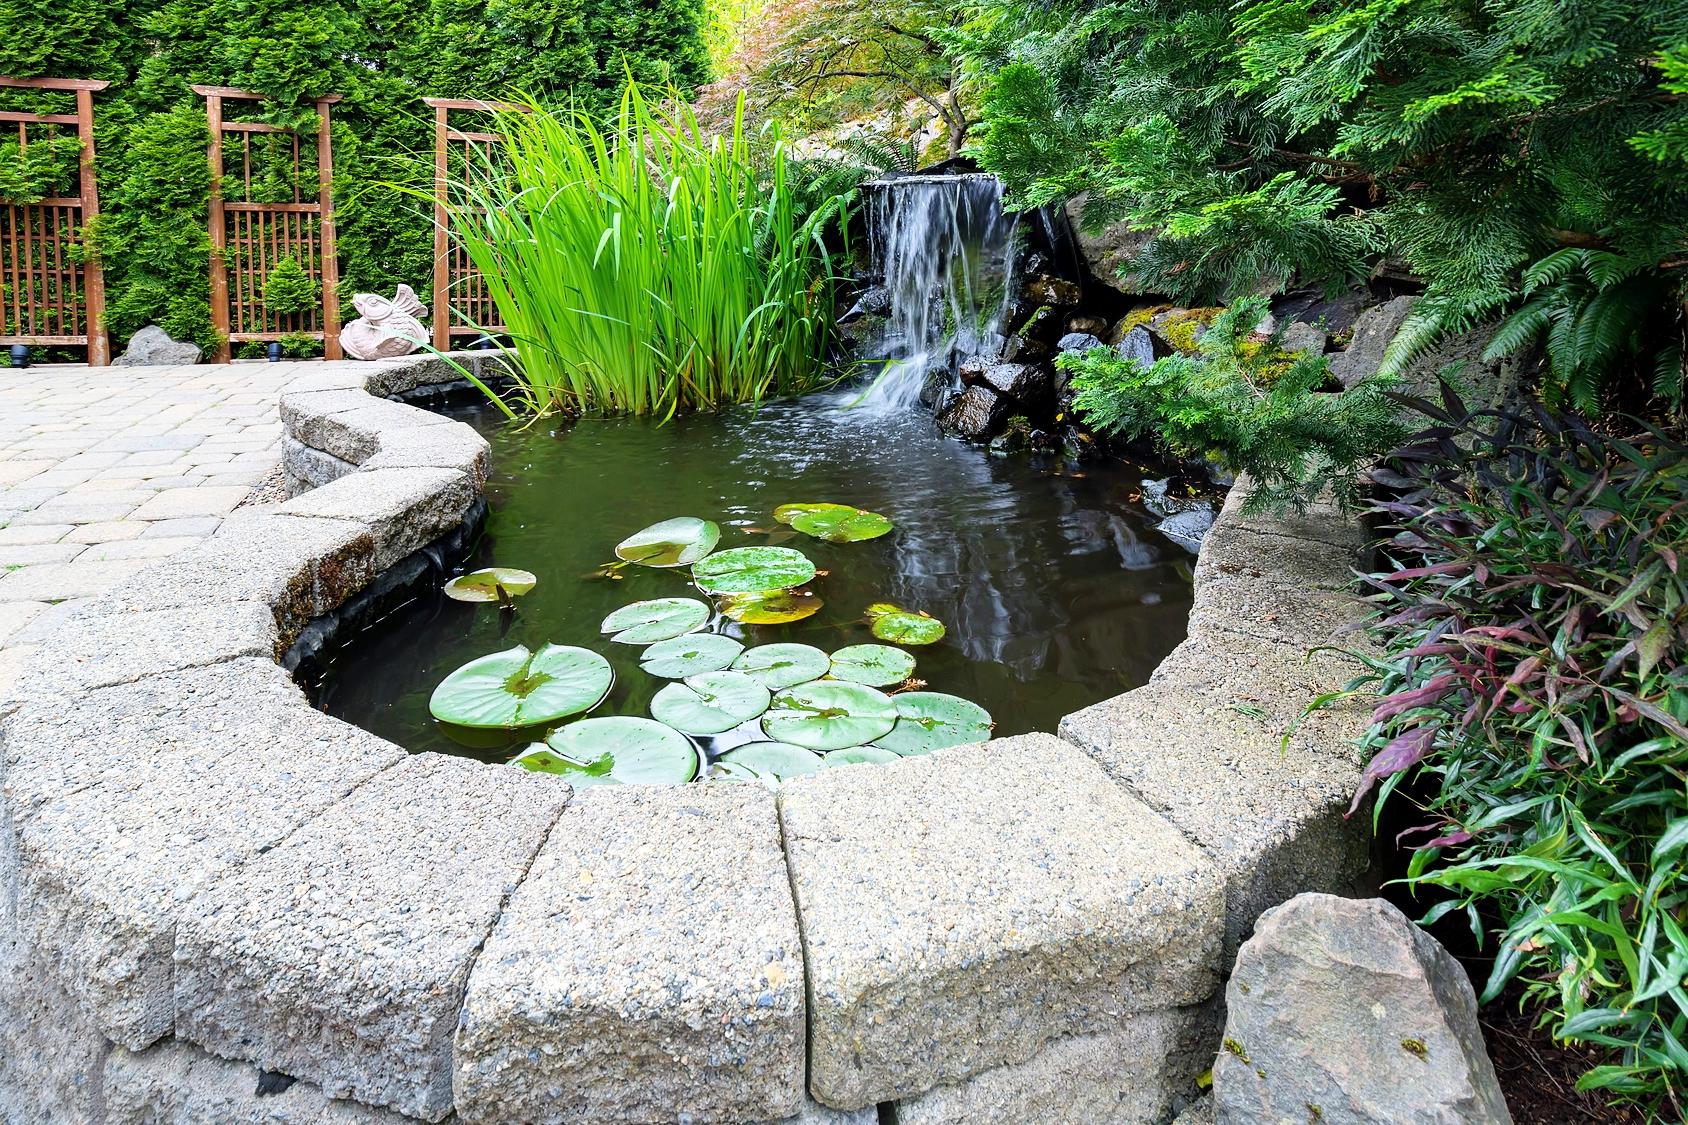 london-ontario-landscaper-pool-pond-design-garden-company-hunter-home-garden-14.jpg